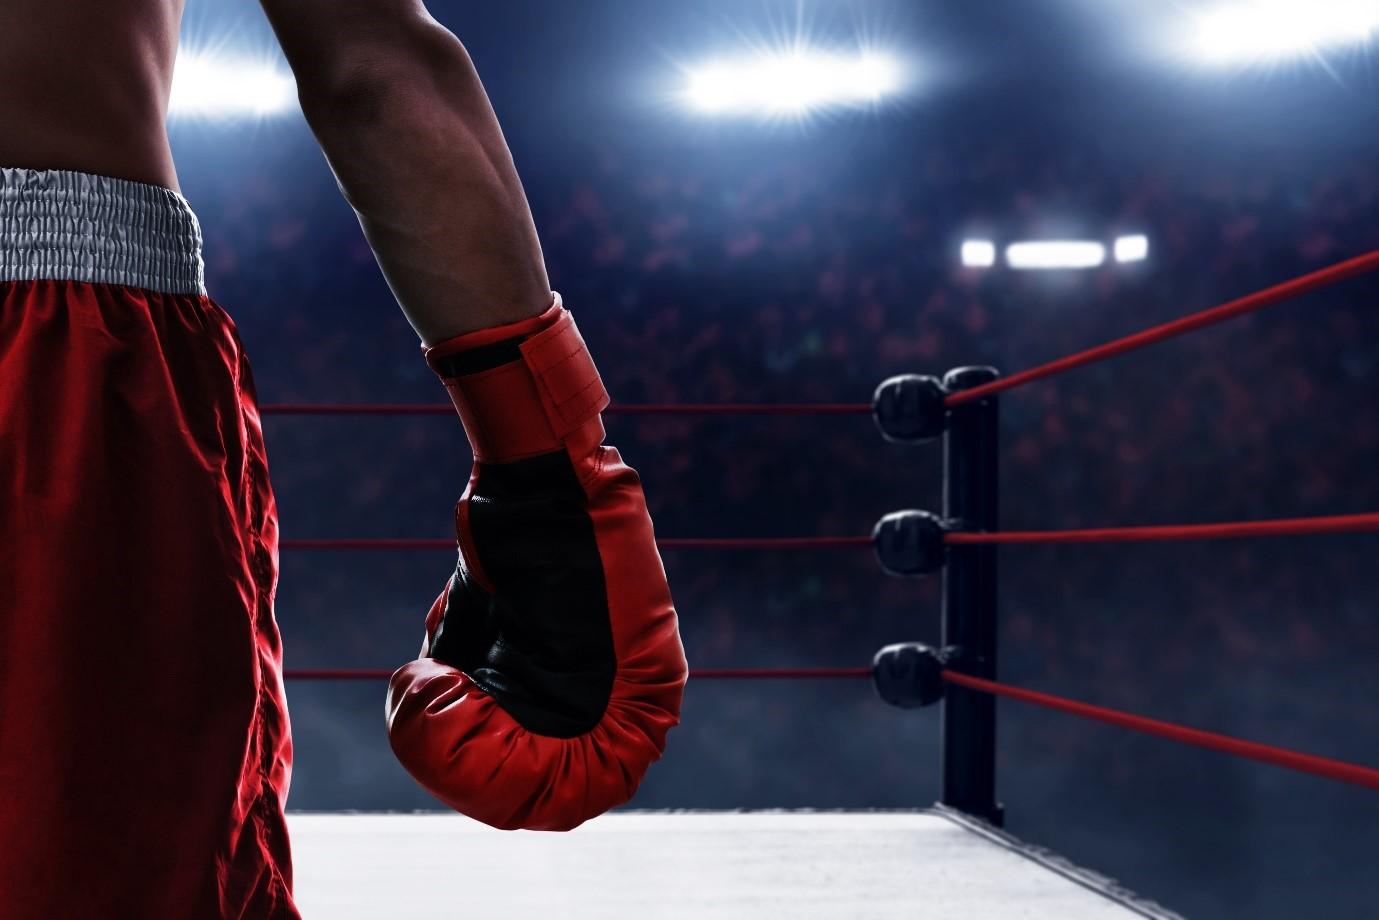 Joshua's defeat leaves Fury v Wilder in a strange position